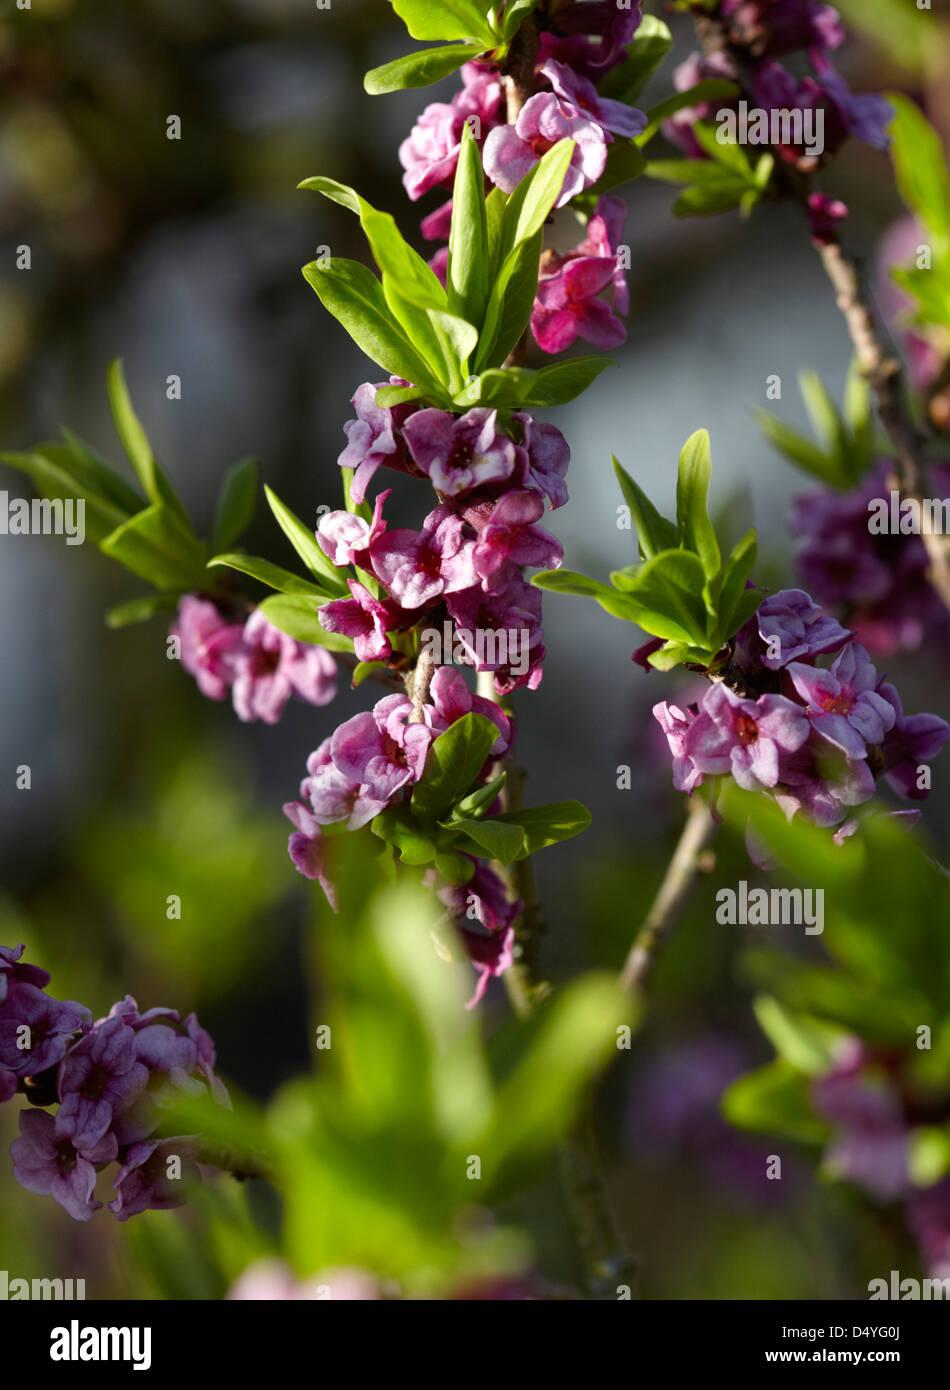 Flowers of Daphne plant - Stock Image